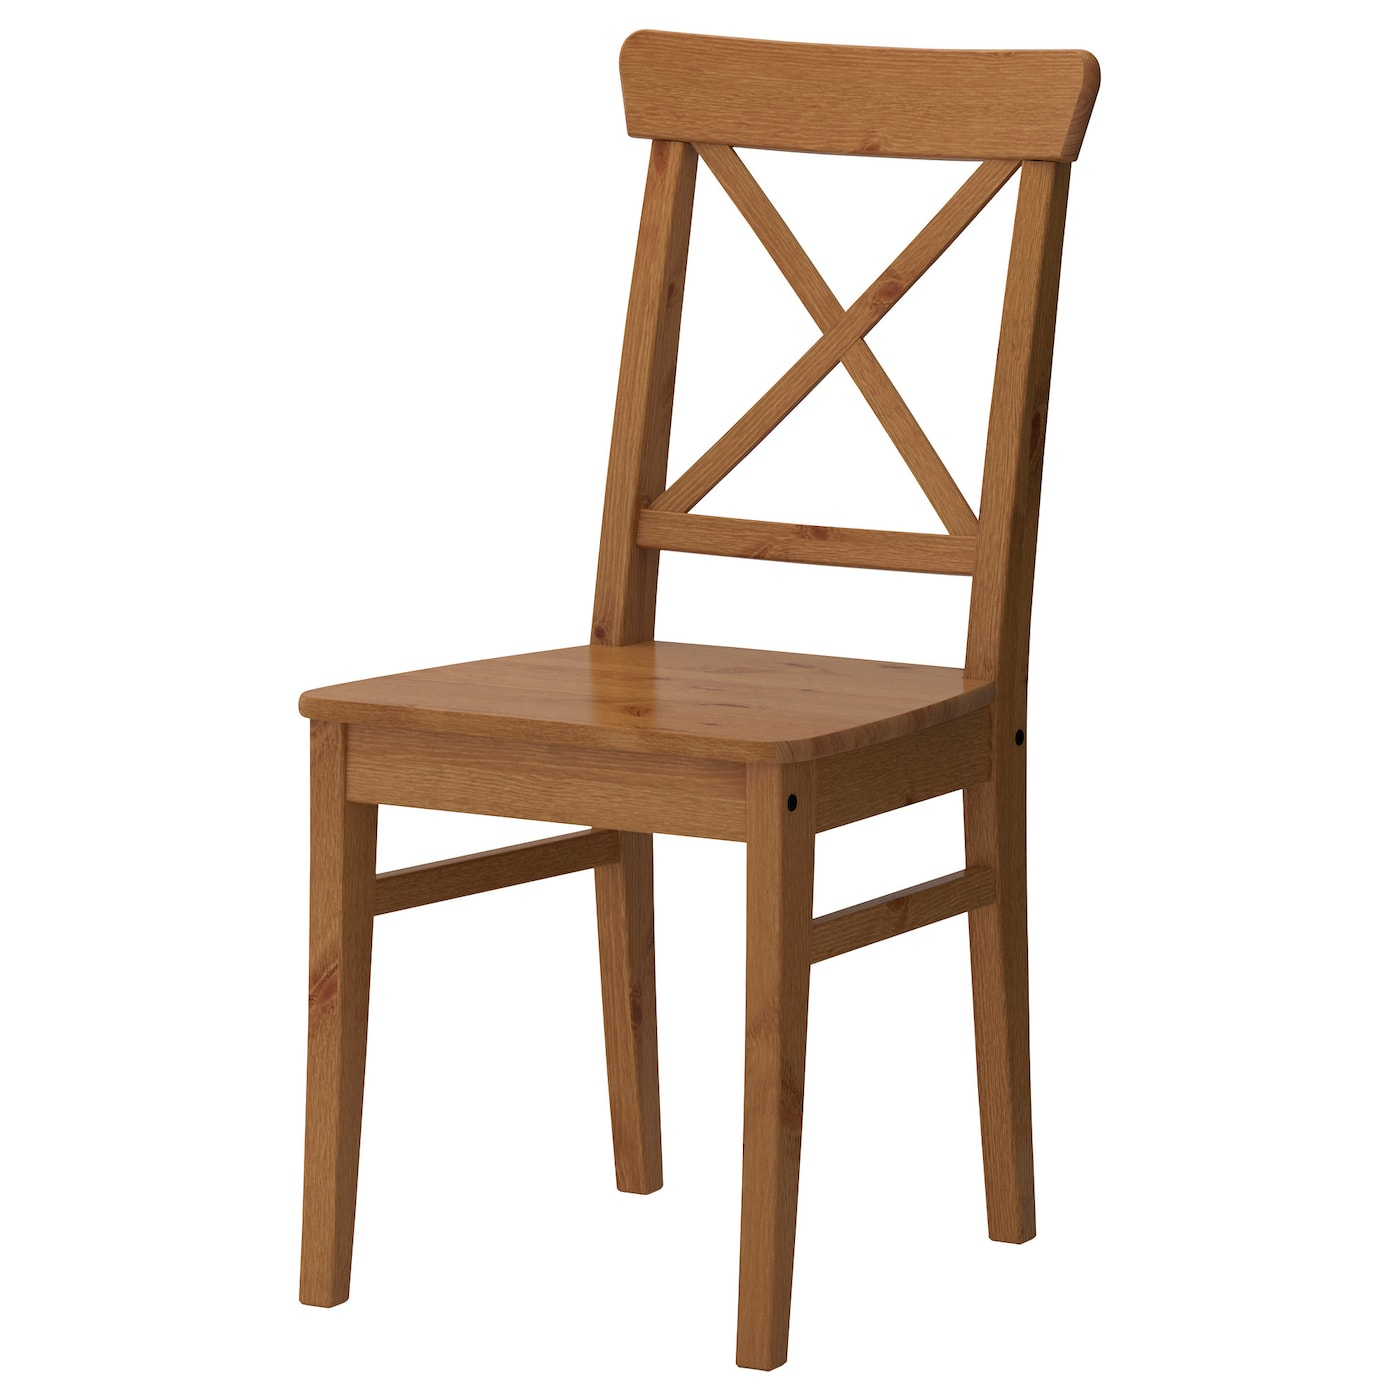 ingolf chaise vernis effet anc ikea. Black Bedroom Furniture Sets. Home Design Ideas